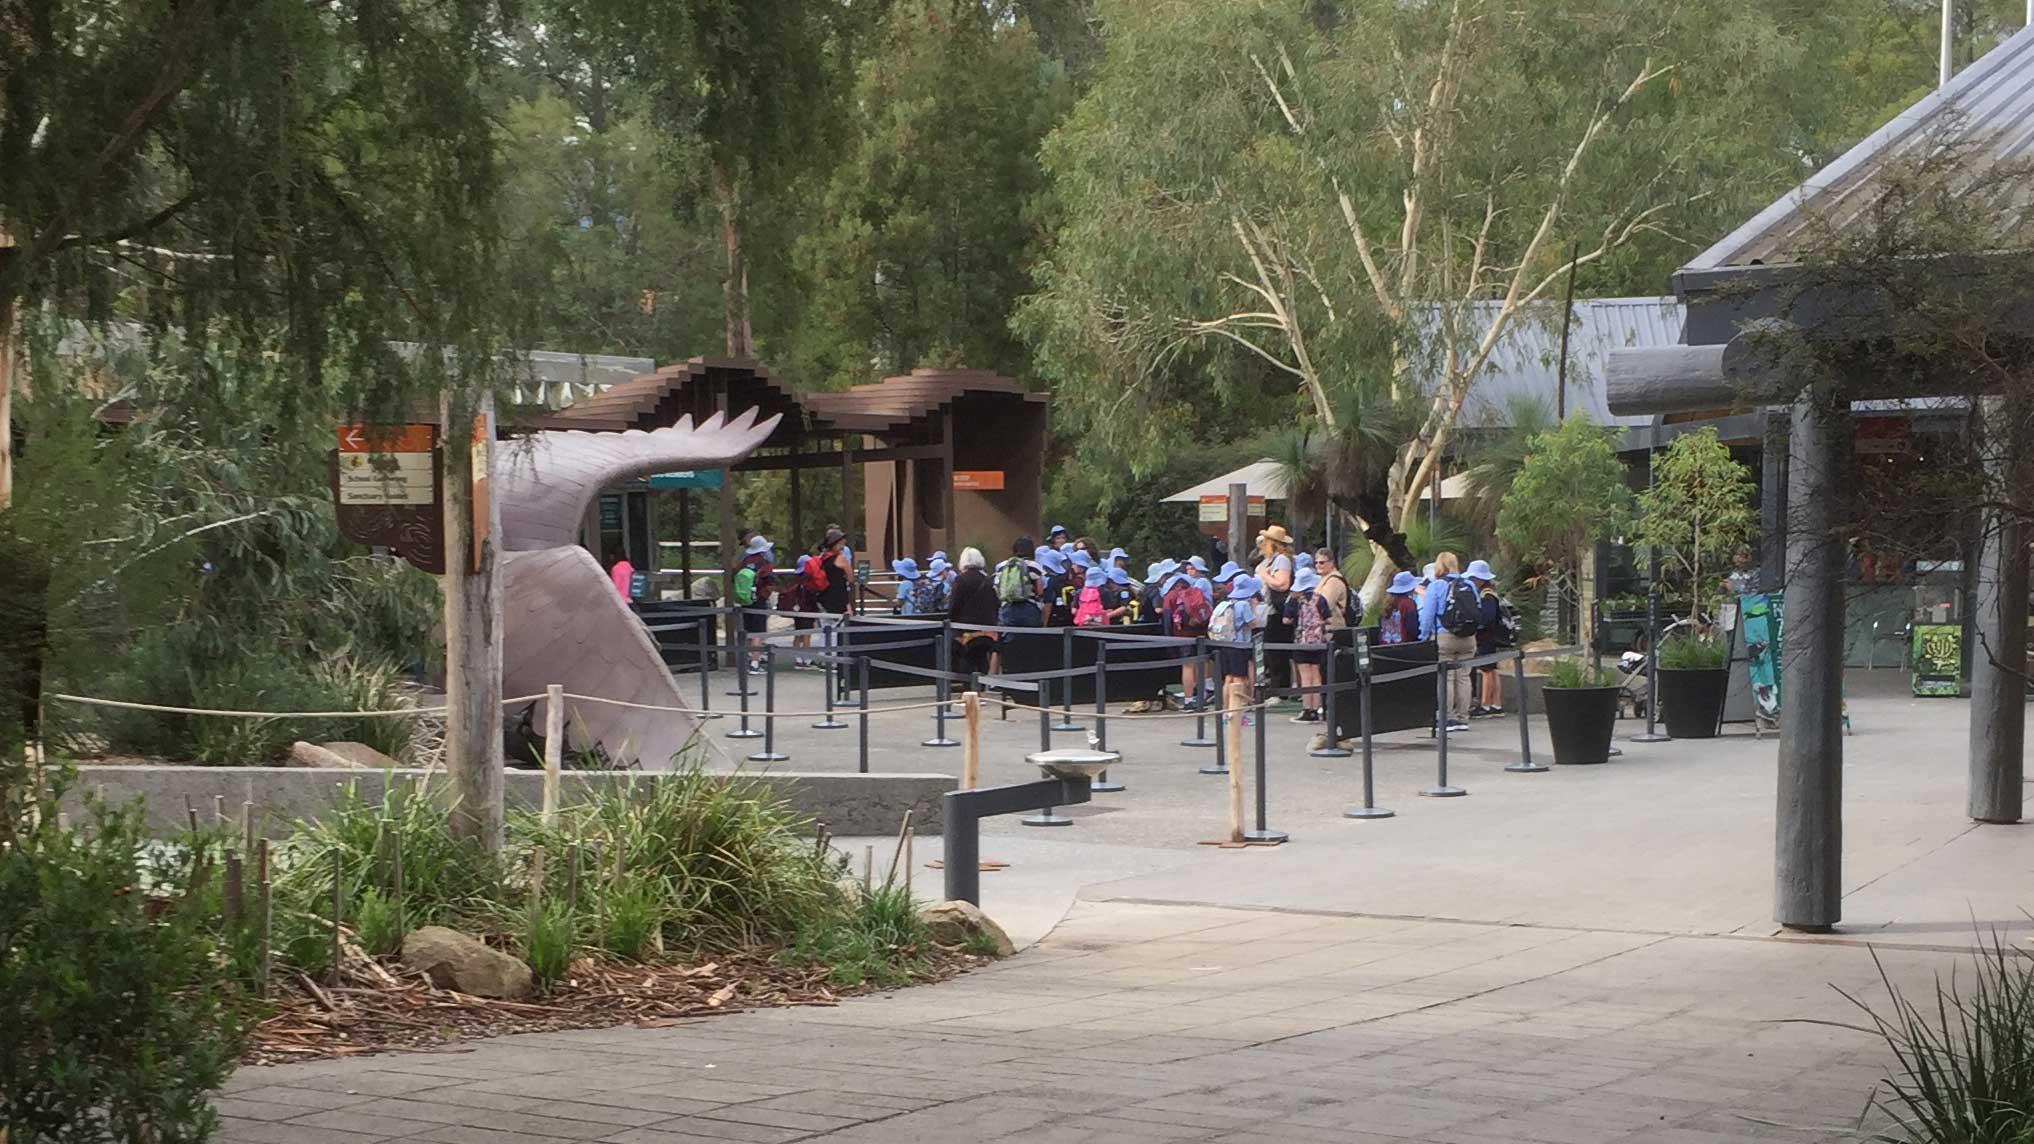 Event: Wipe For Wildlife (Zoos Victoria)